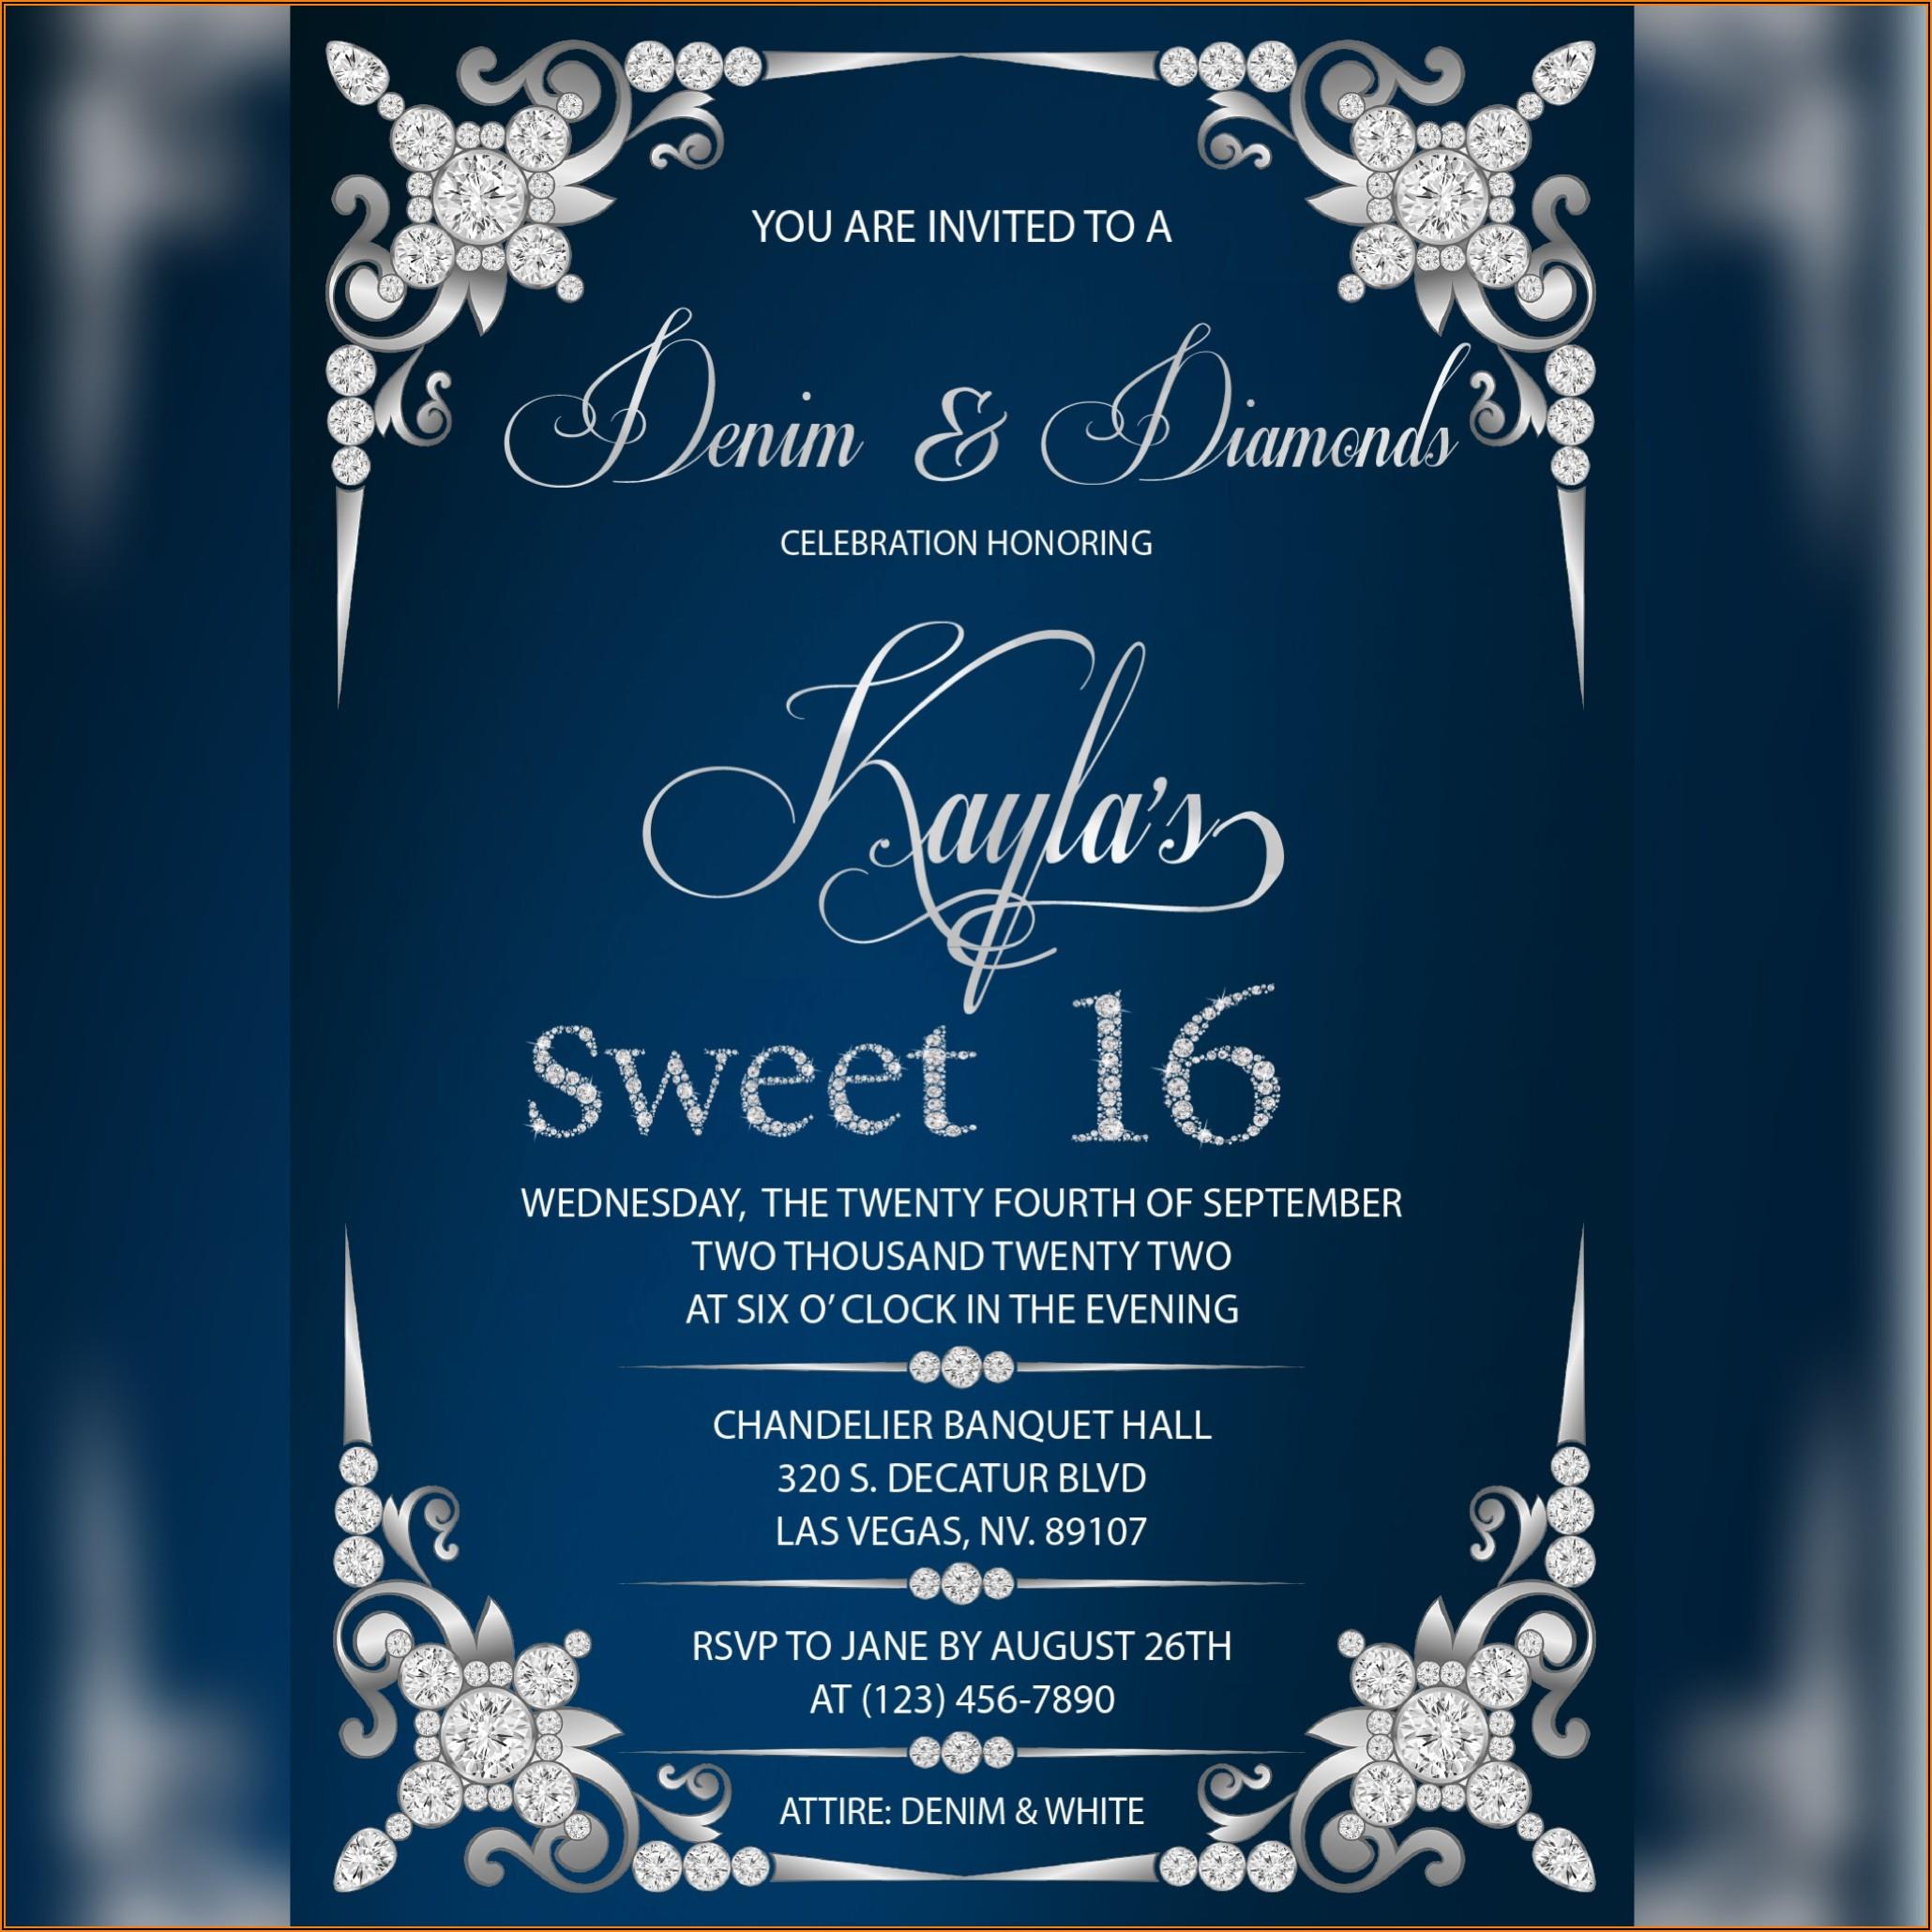 Denim And Diamonds Invitations Free